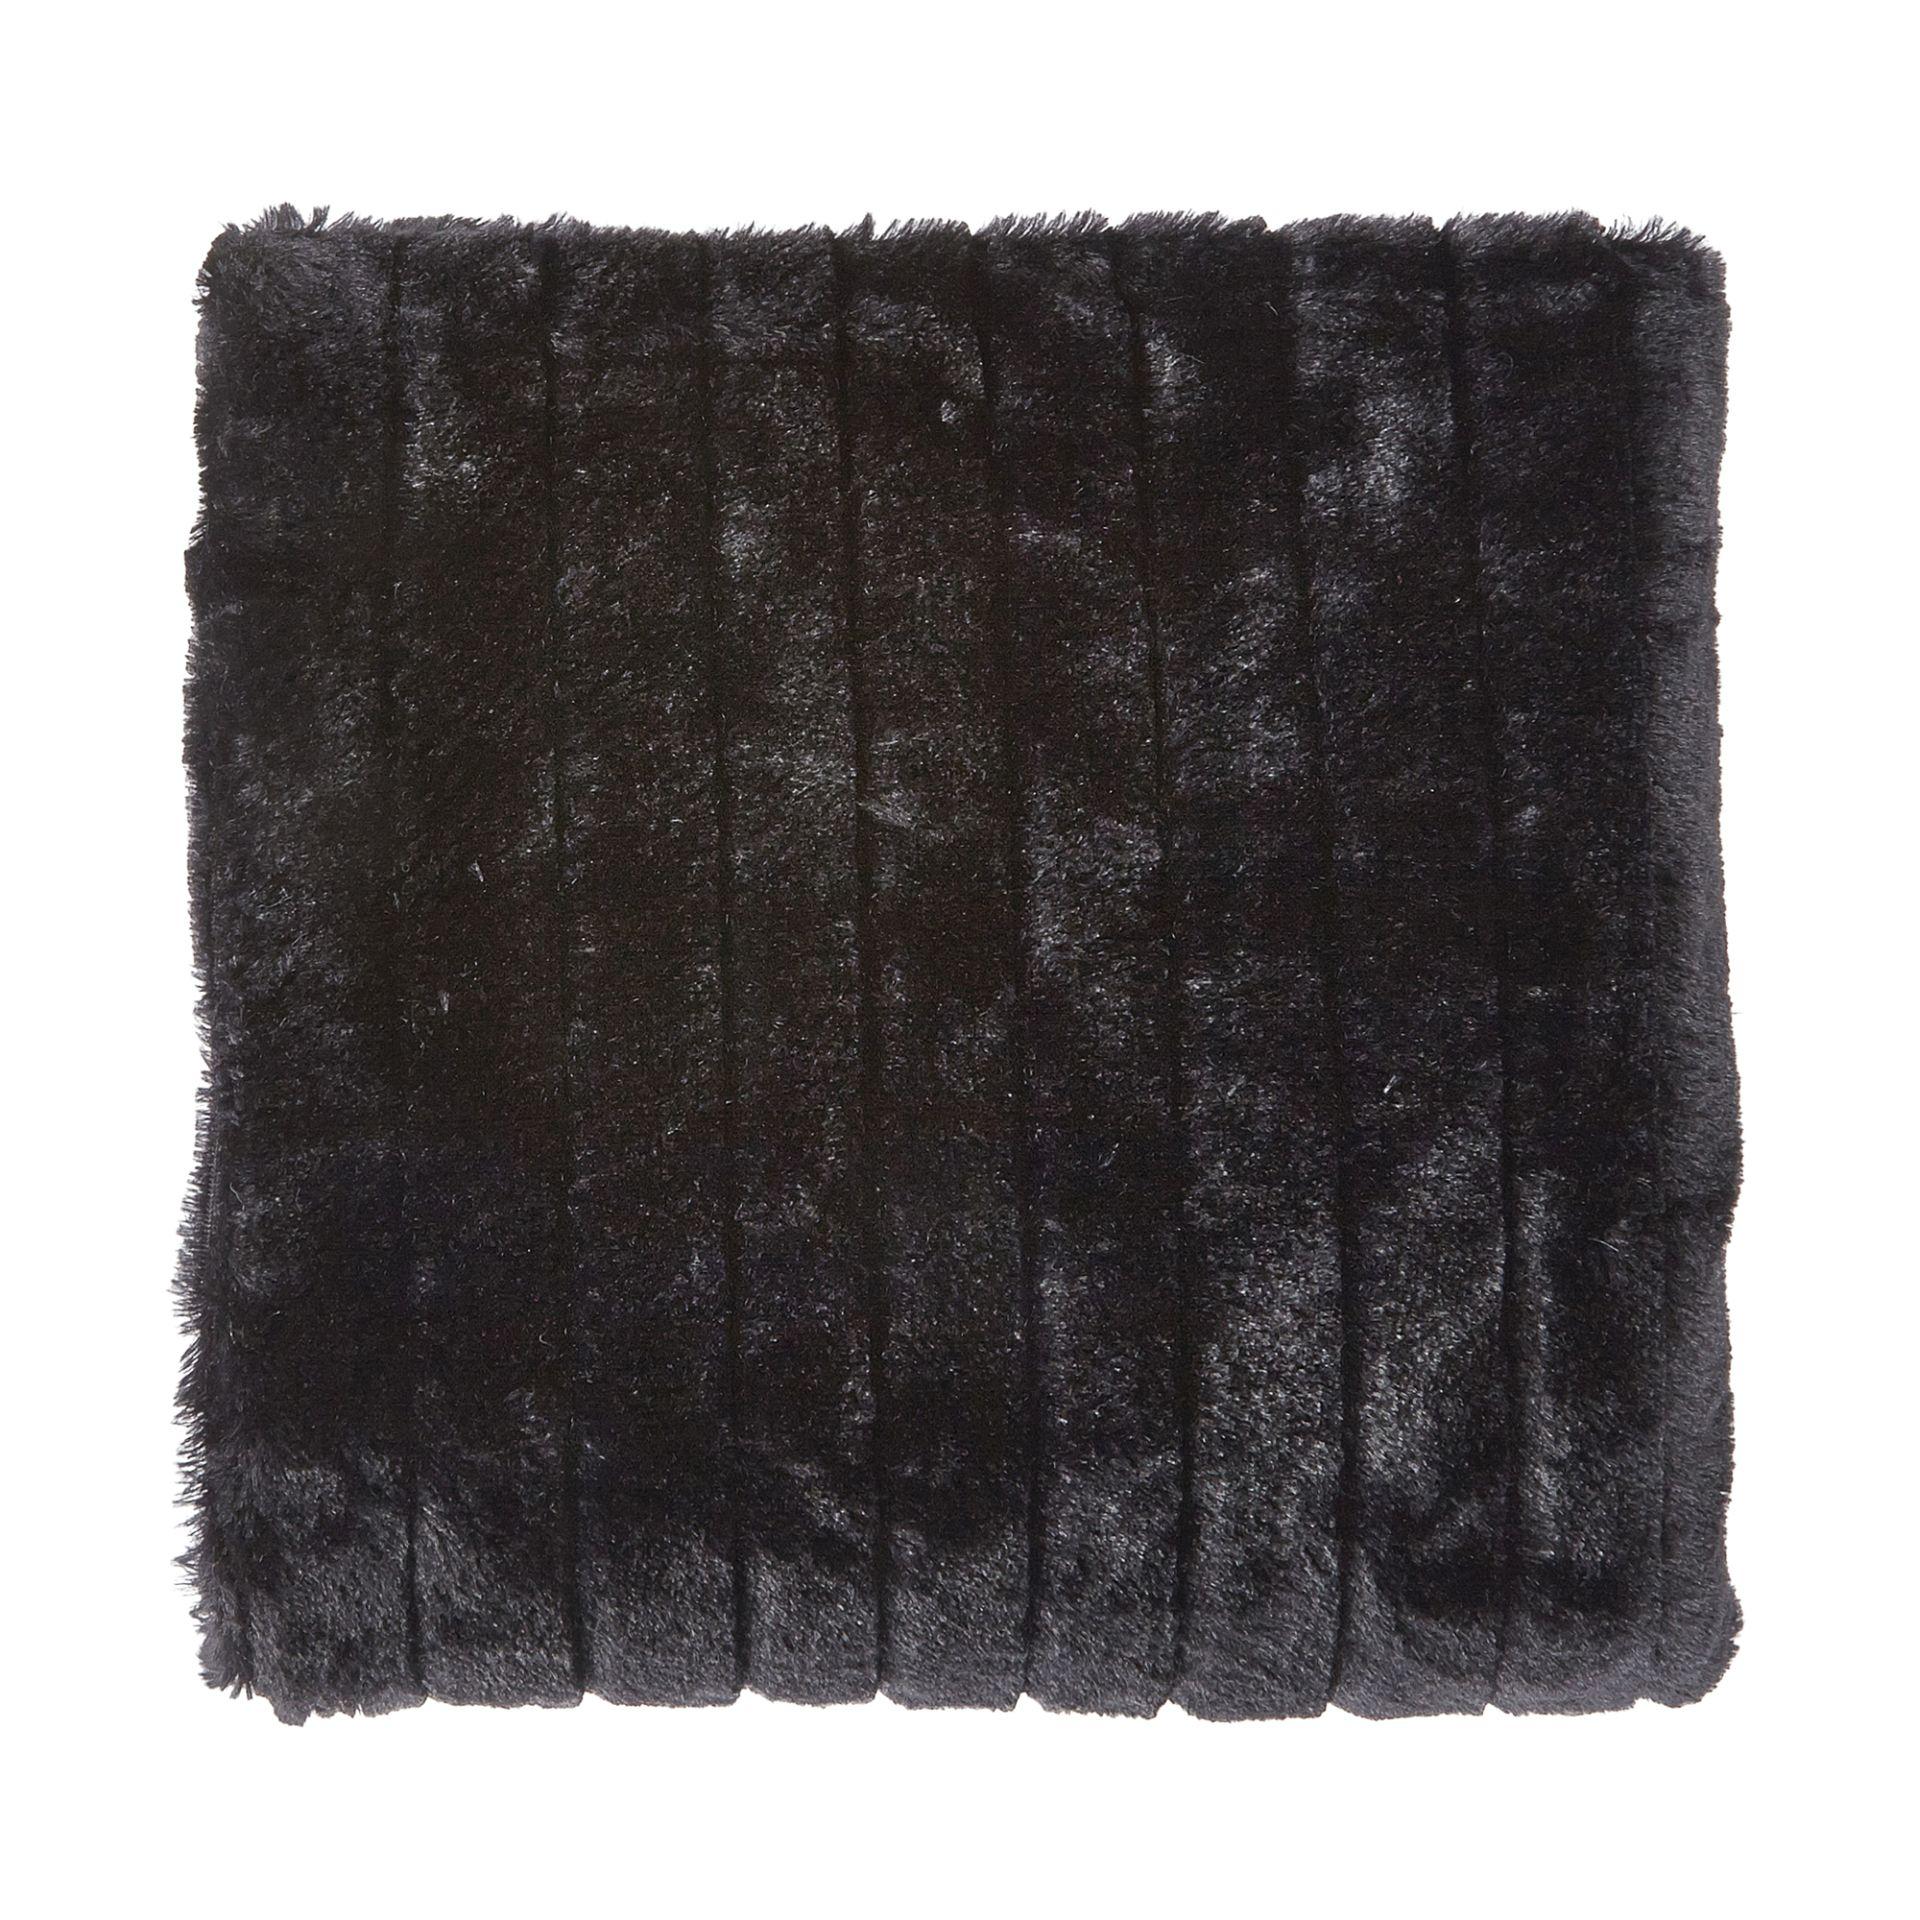 YORICK - Plaid zwart 130x180 cm